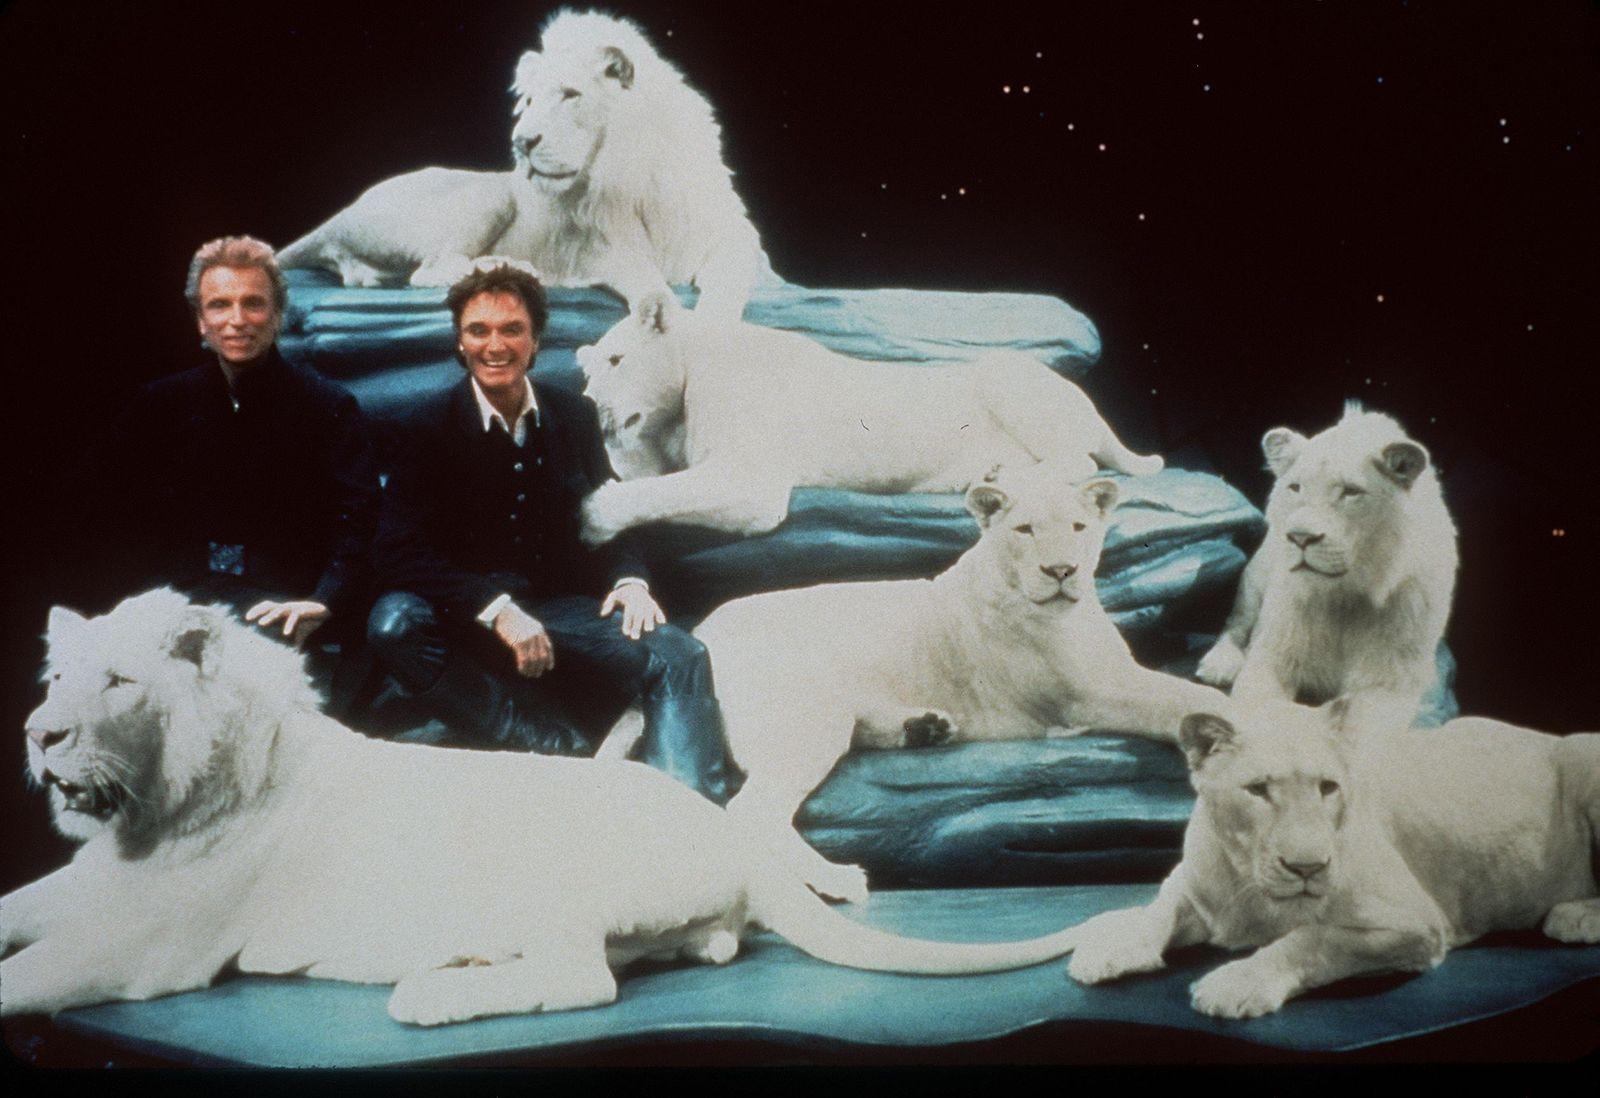 Siegfried & Roy With Their White Lions Stage Set Pf Thier Las Vegas Show Siegfried